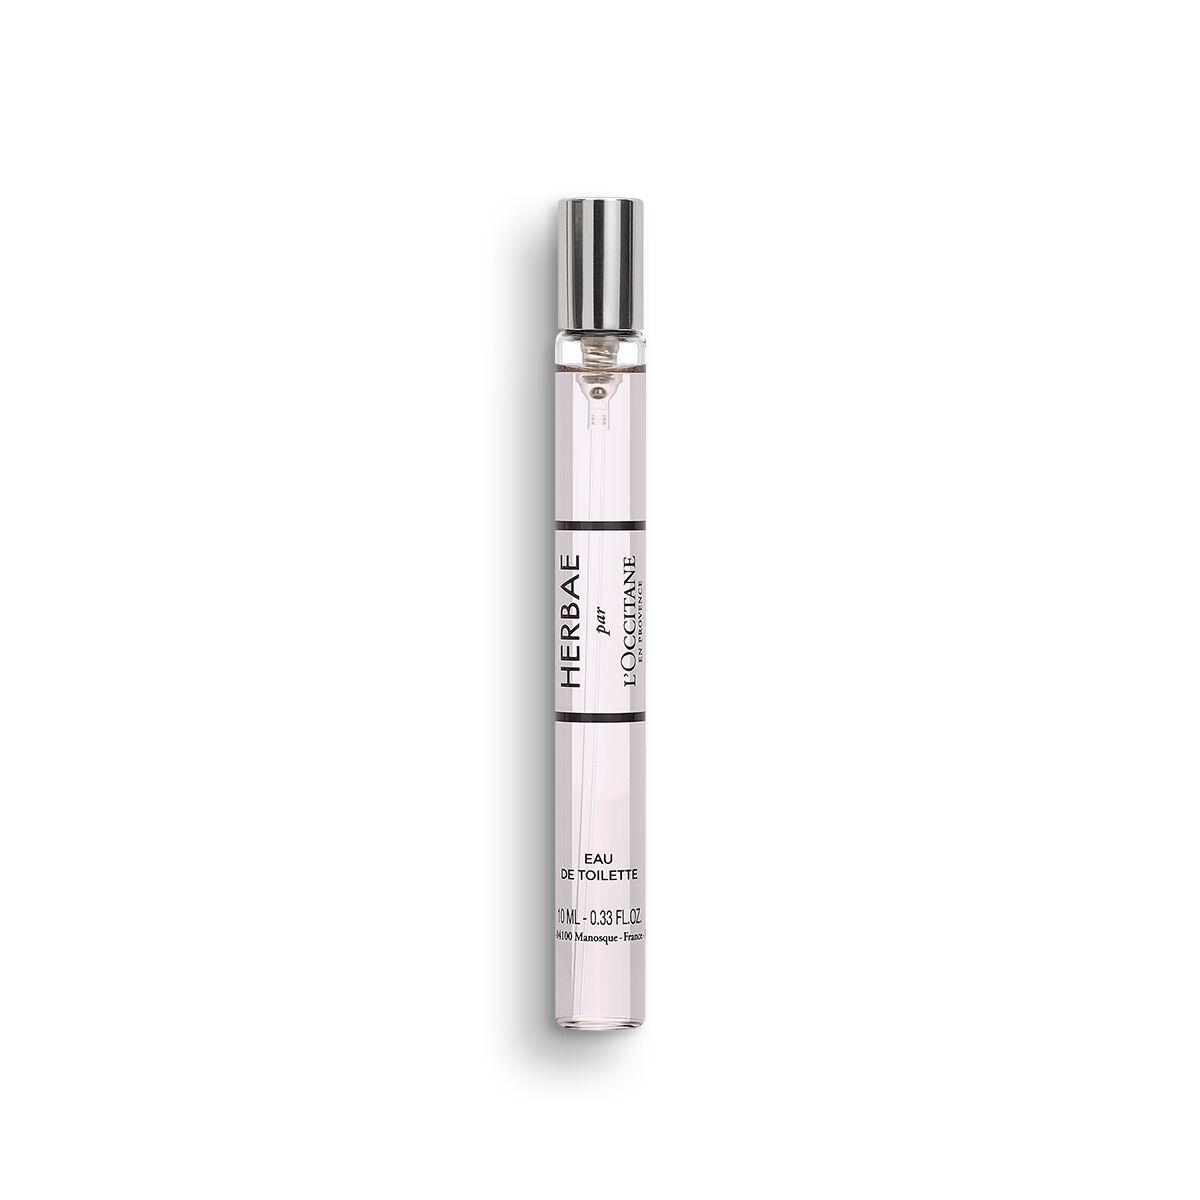 Herbae L'Eau Purse Spray 0.33